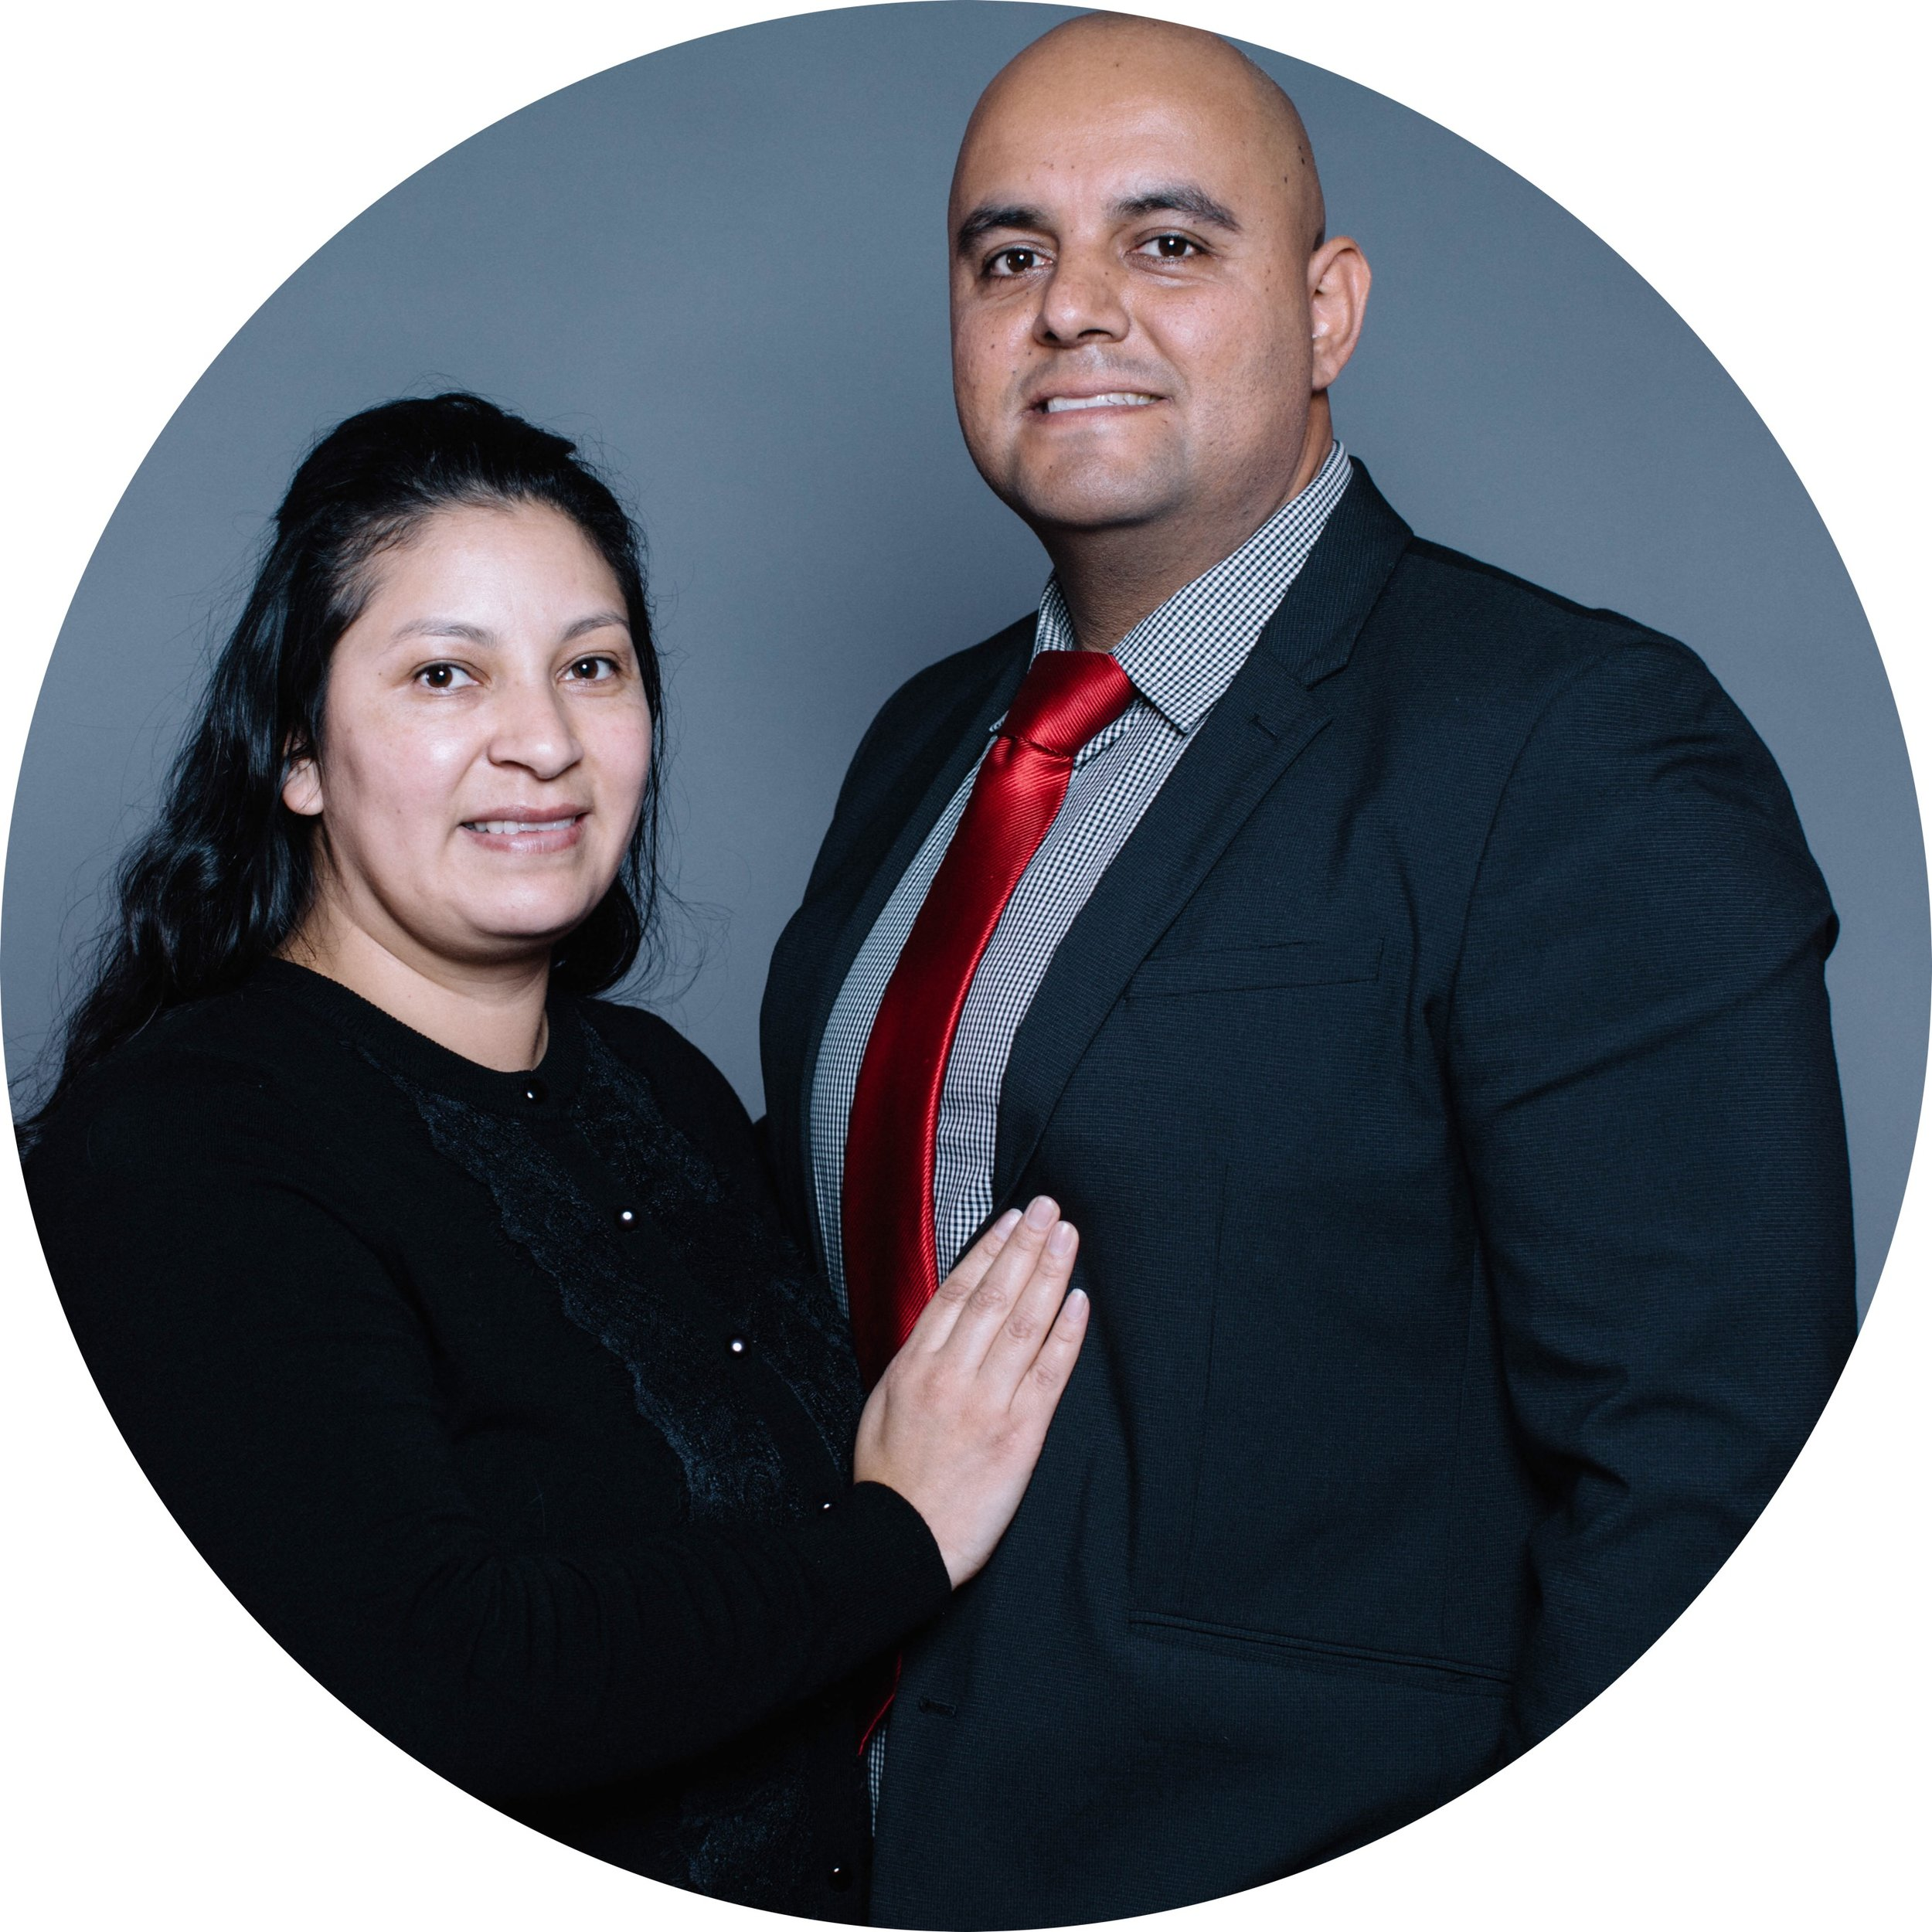 Líder de Jóvenes - Hernan & Nancy Perez